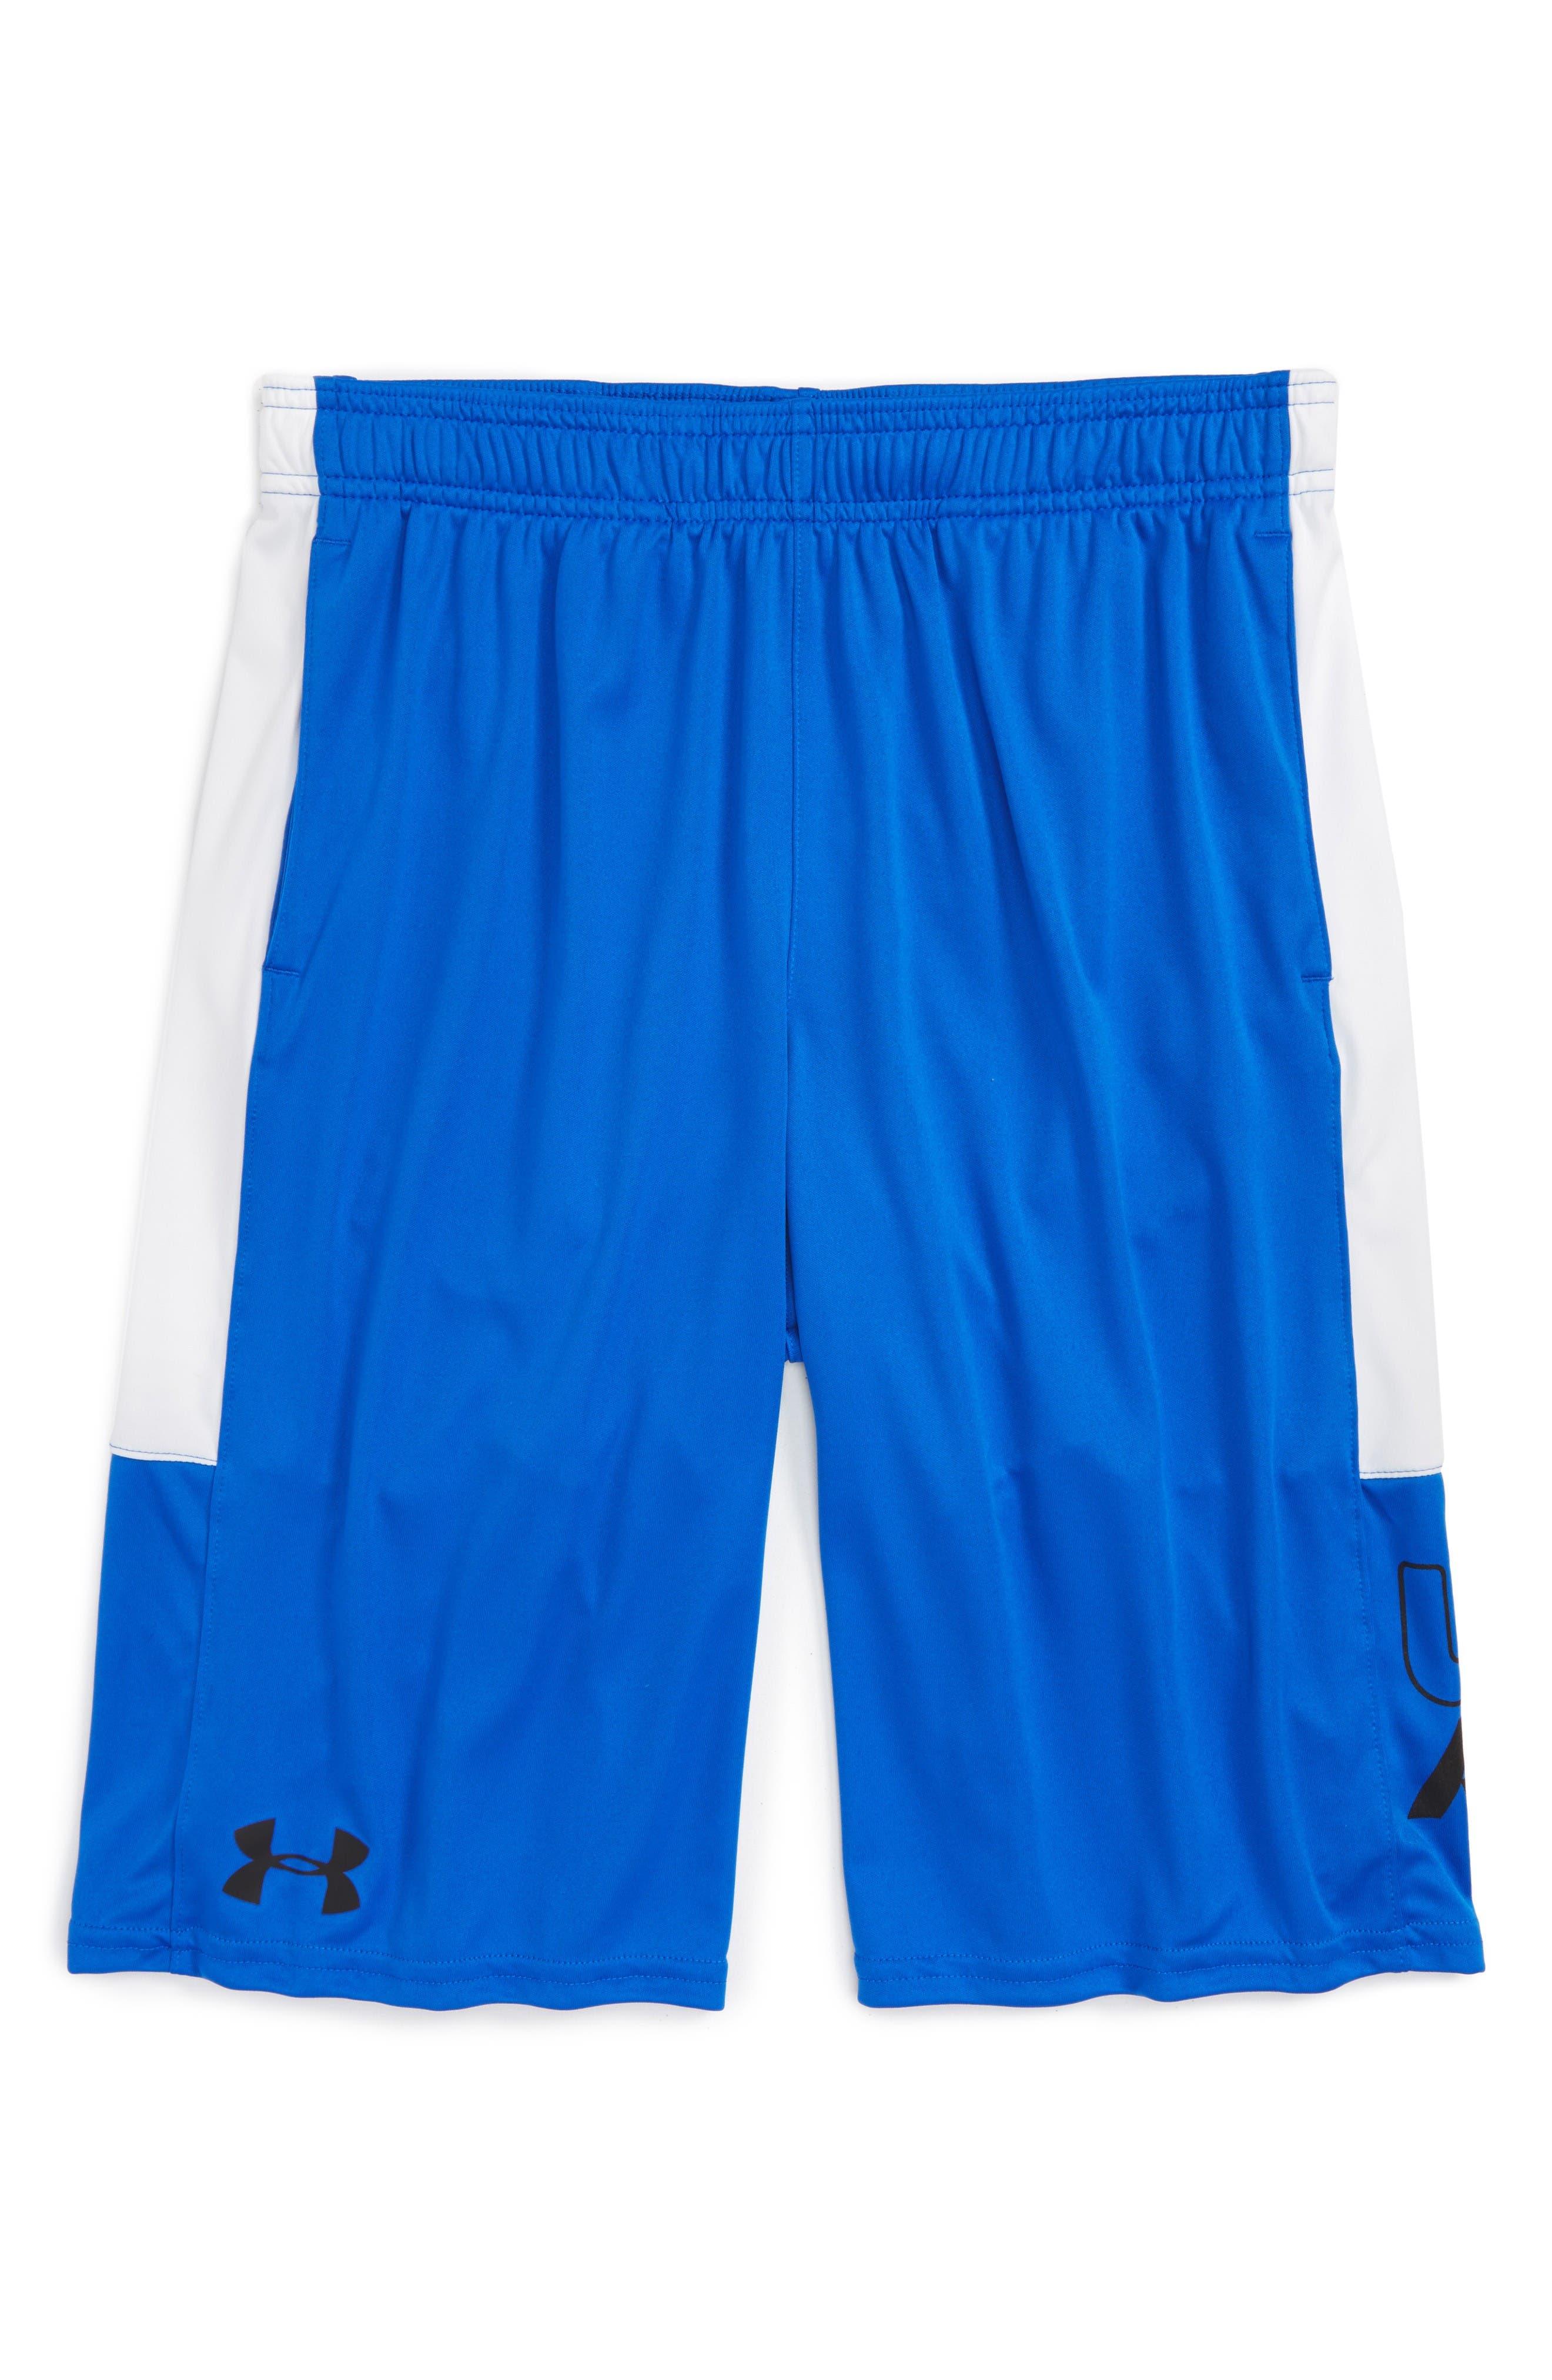 Stunt HeatGear<sup>®</sup> Shorts,                             Main thumbnail 1, color,                             Ultra Blue/ White/ Black